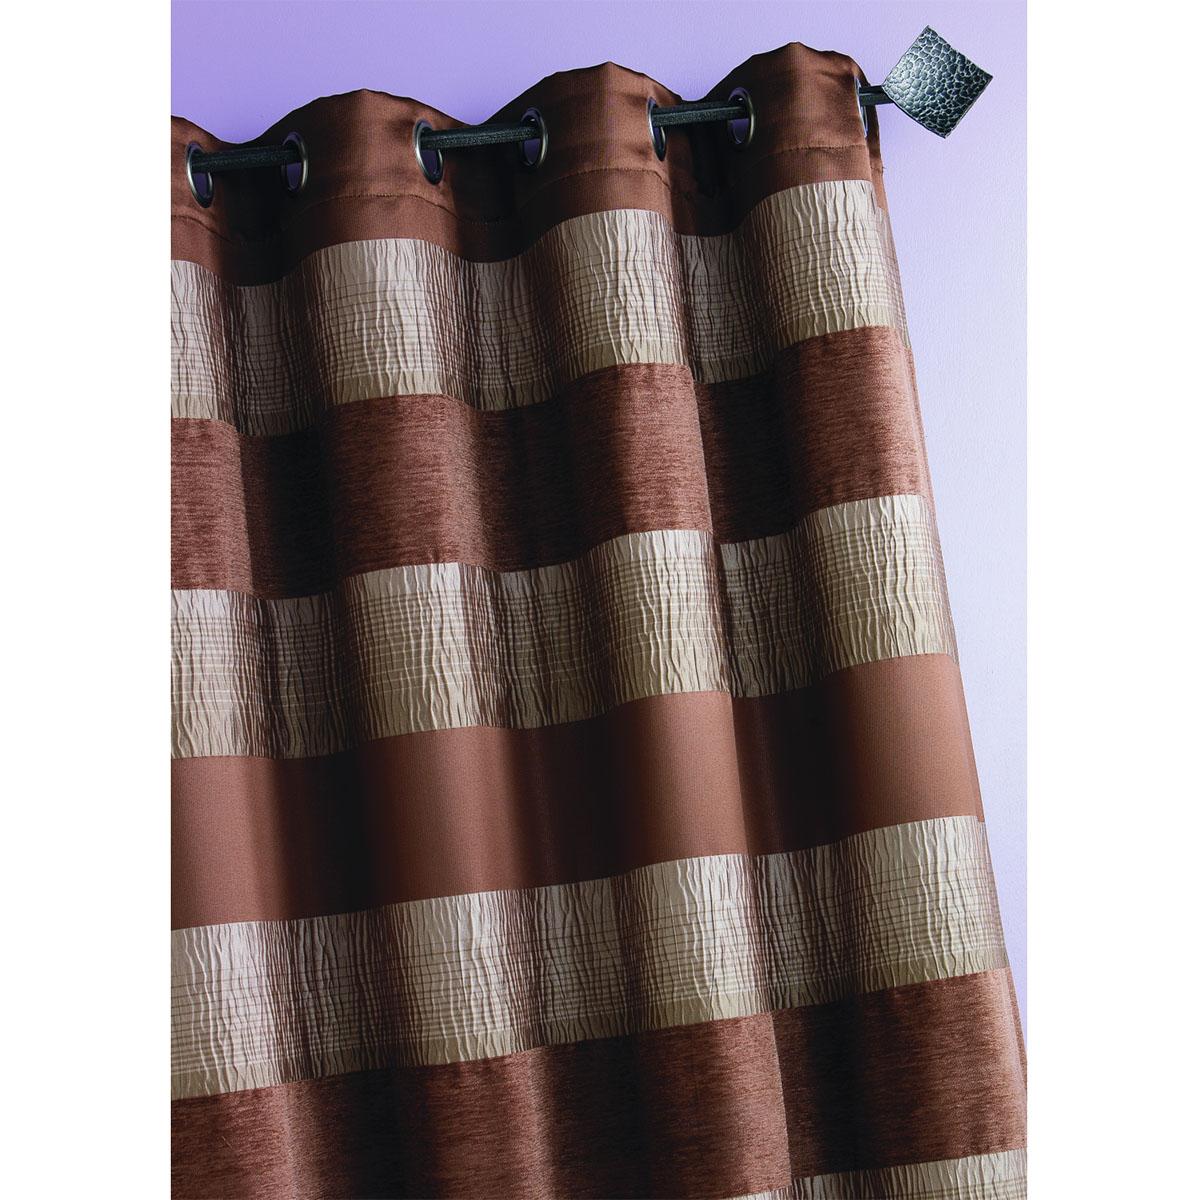 Rideau Jacquard grosses rayures horizontales (Taupe)